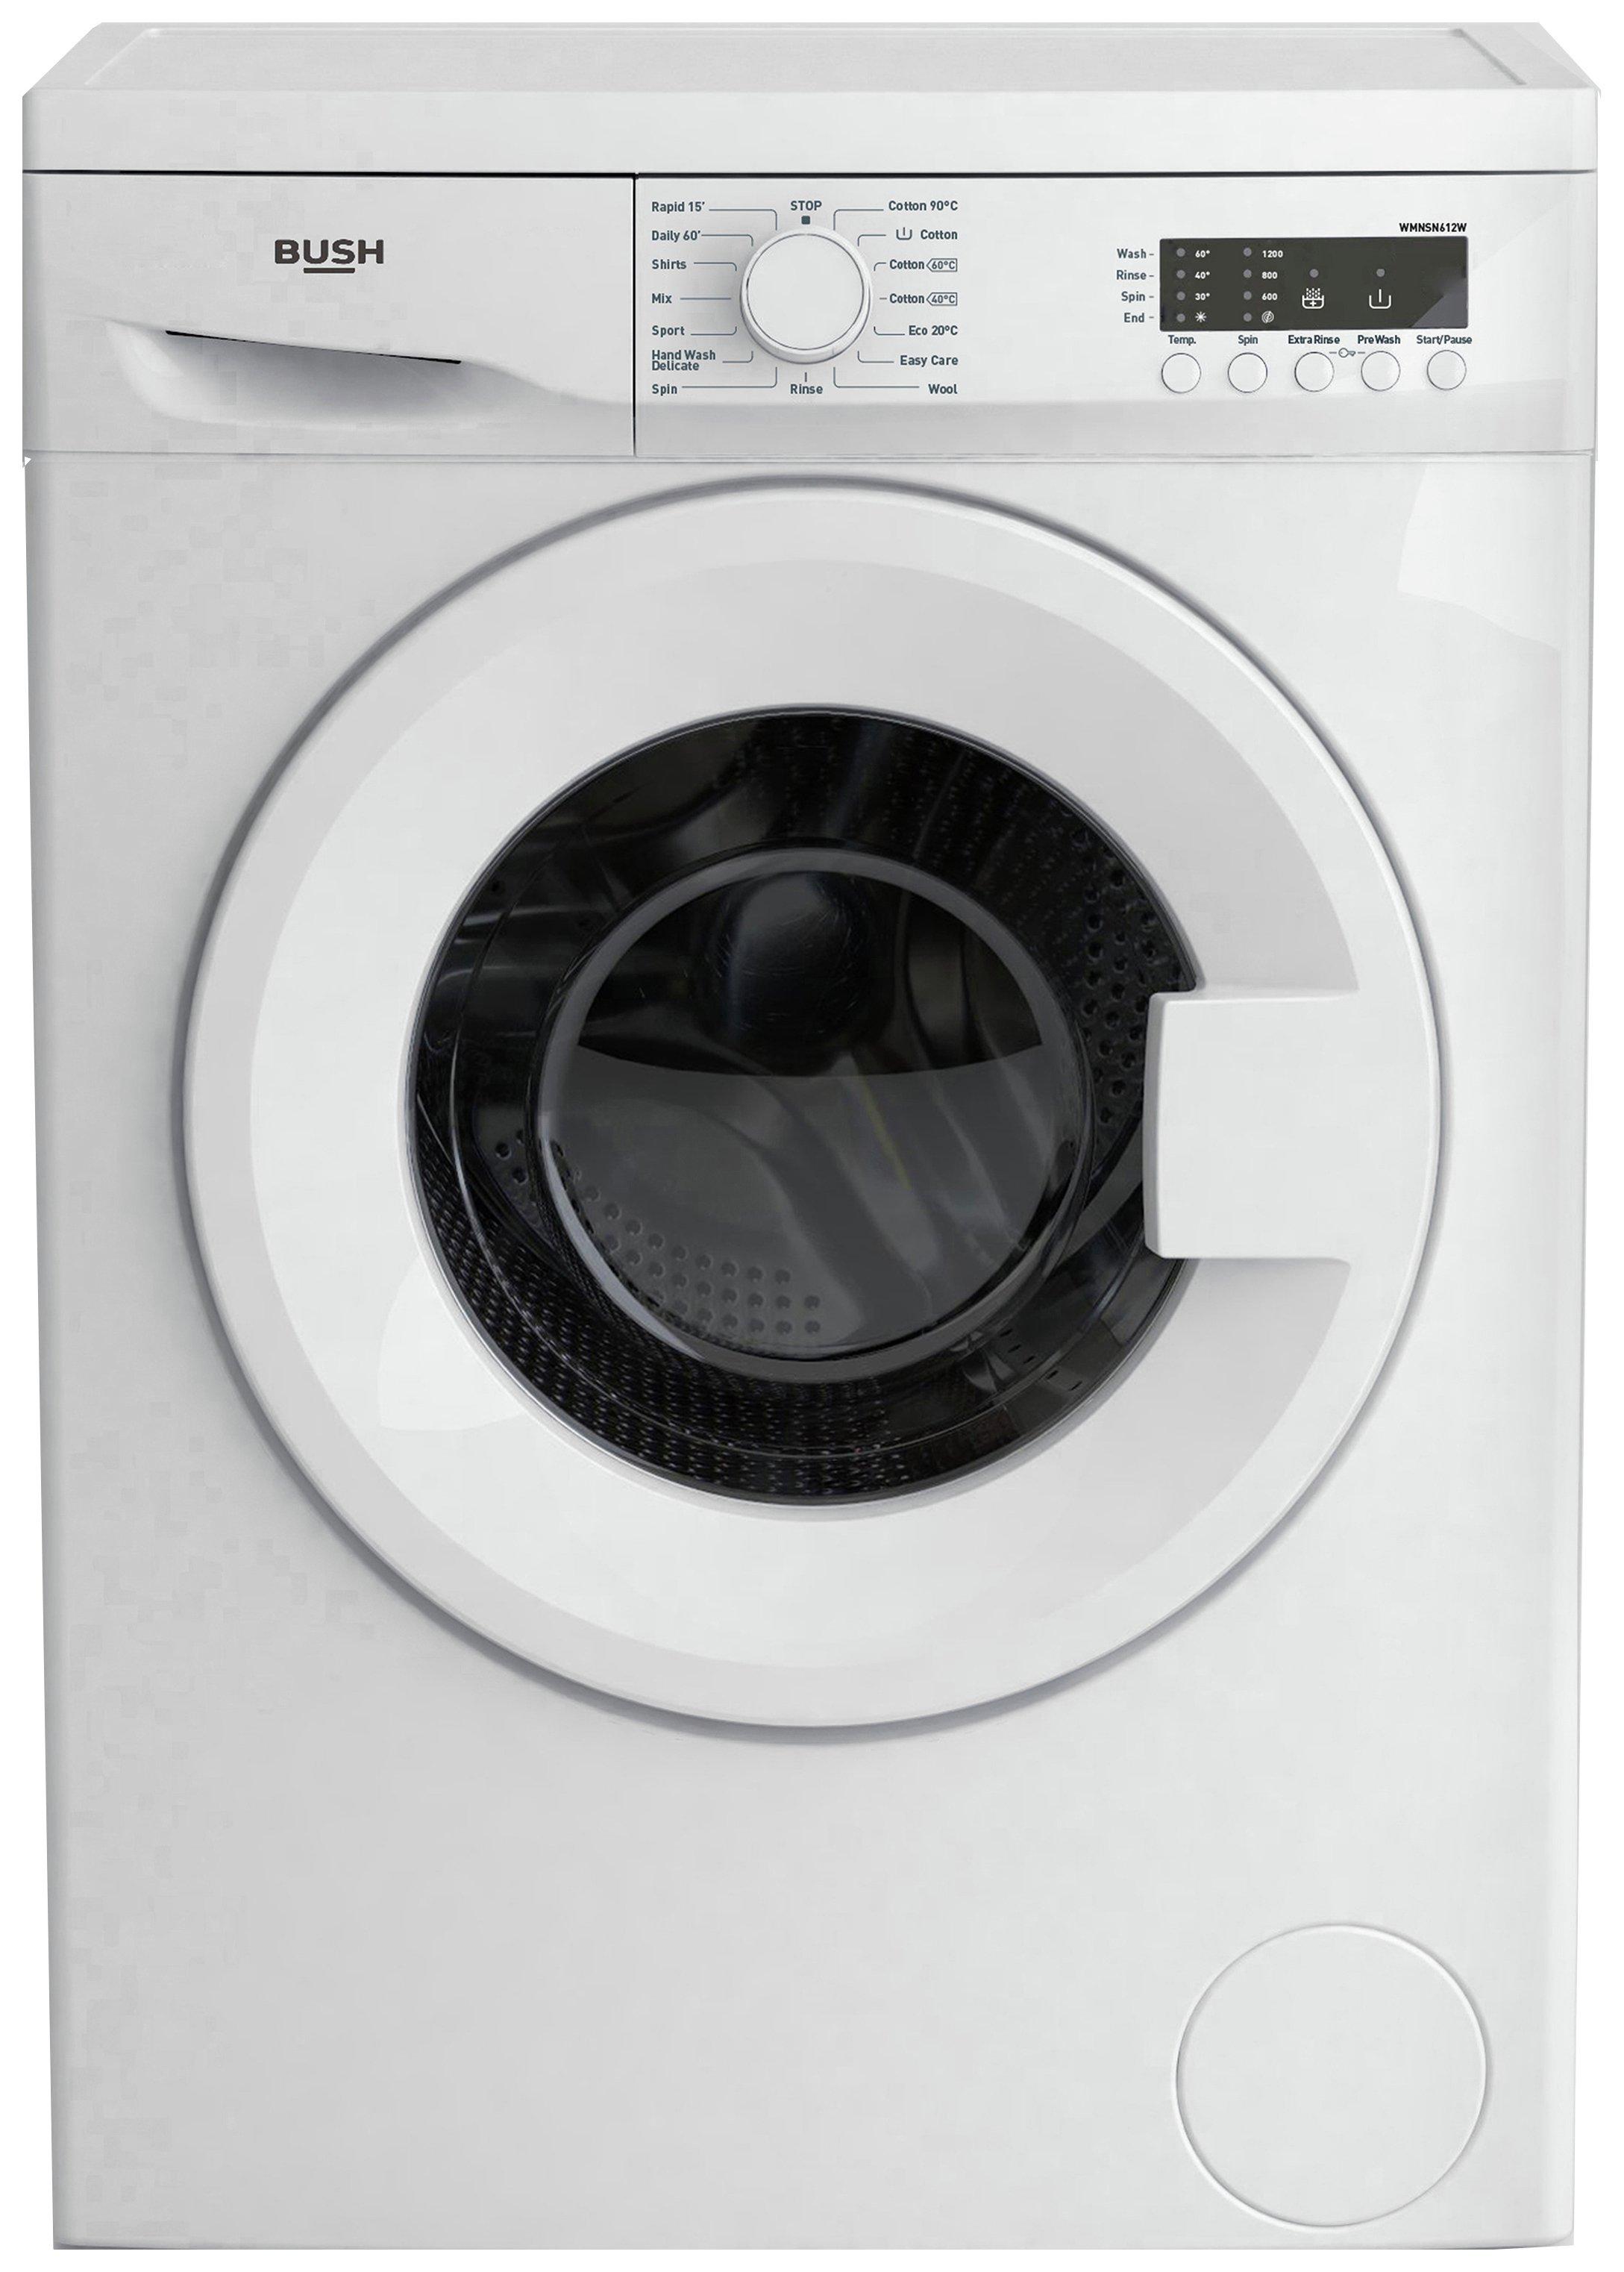 buy bush washing machines at your online. Black Bedroom Furniture Sets. Home Design Ideas